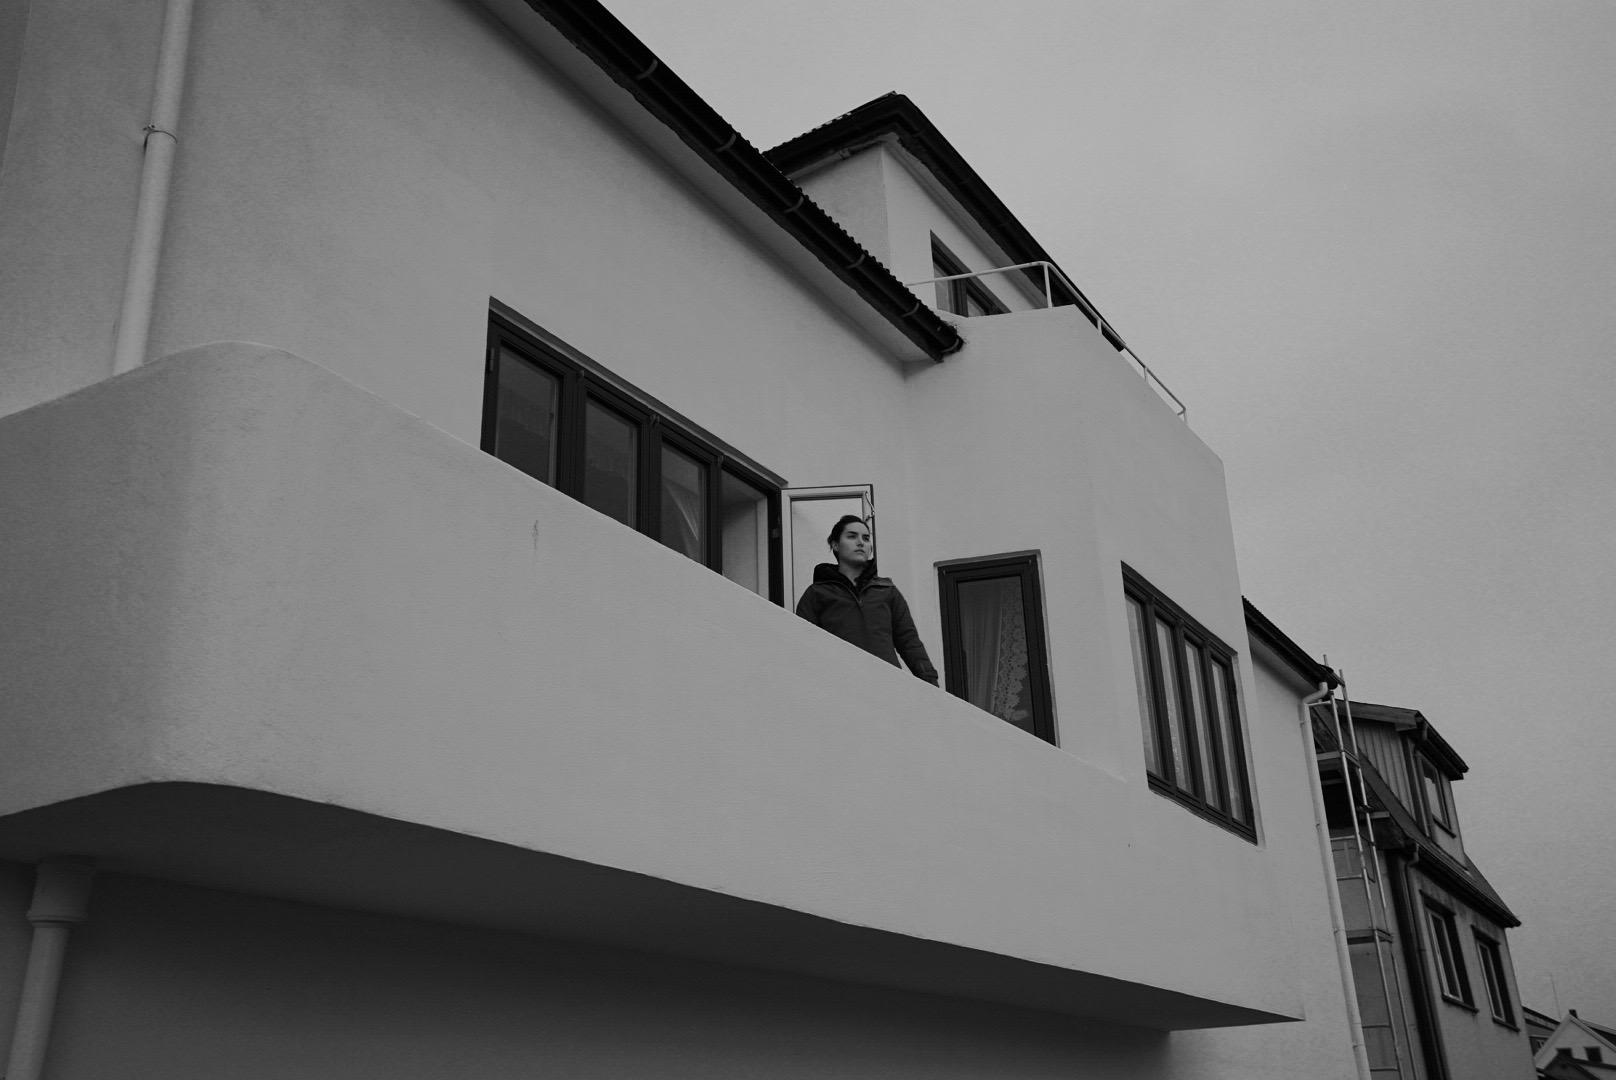 Me on the King's balcony. Faroe Islands - October 2017